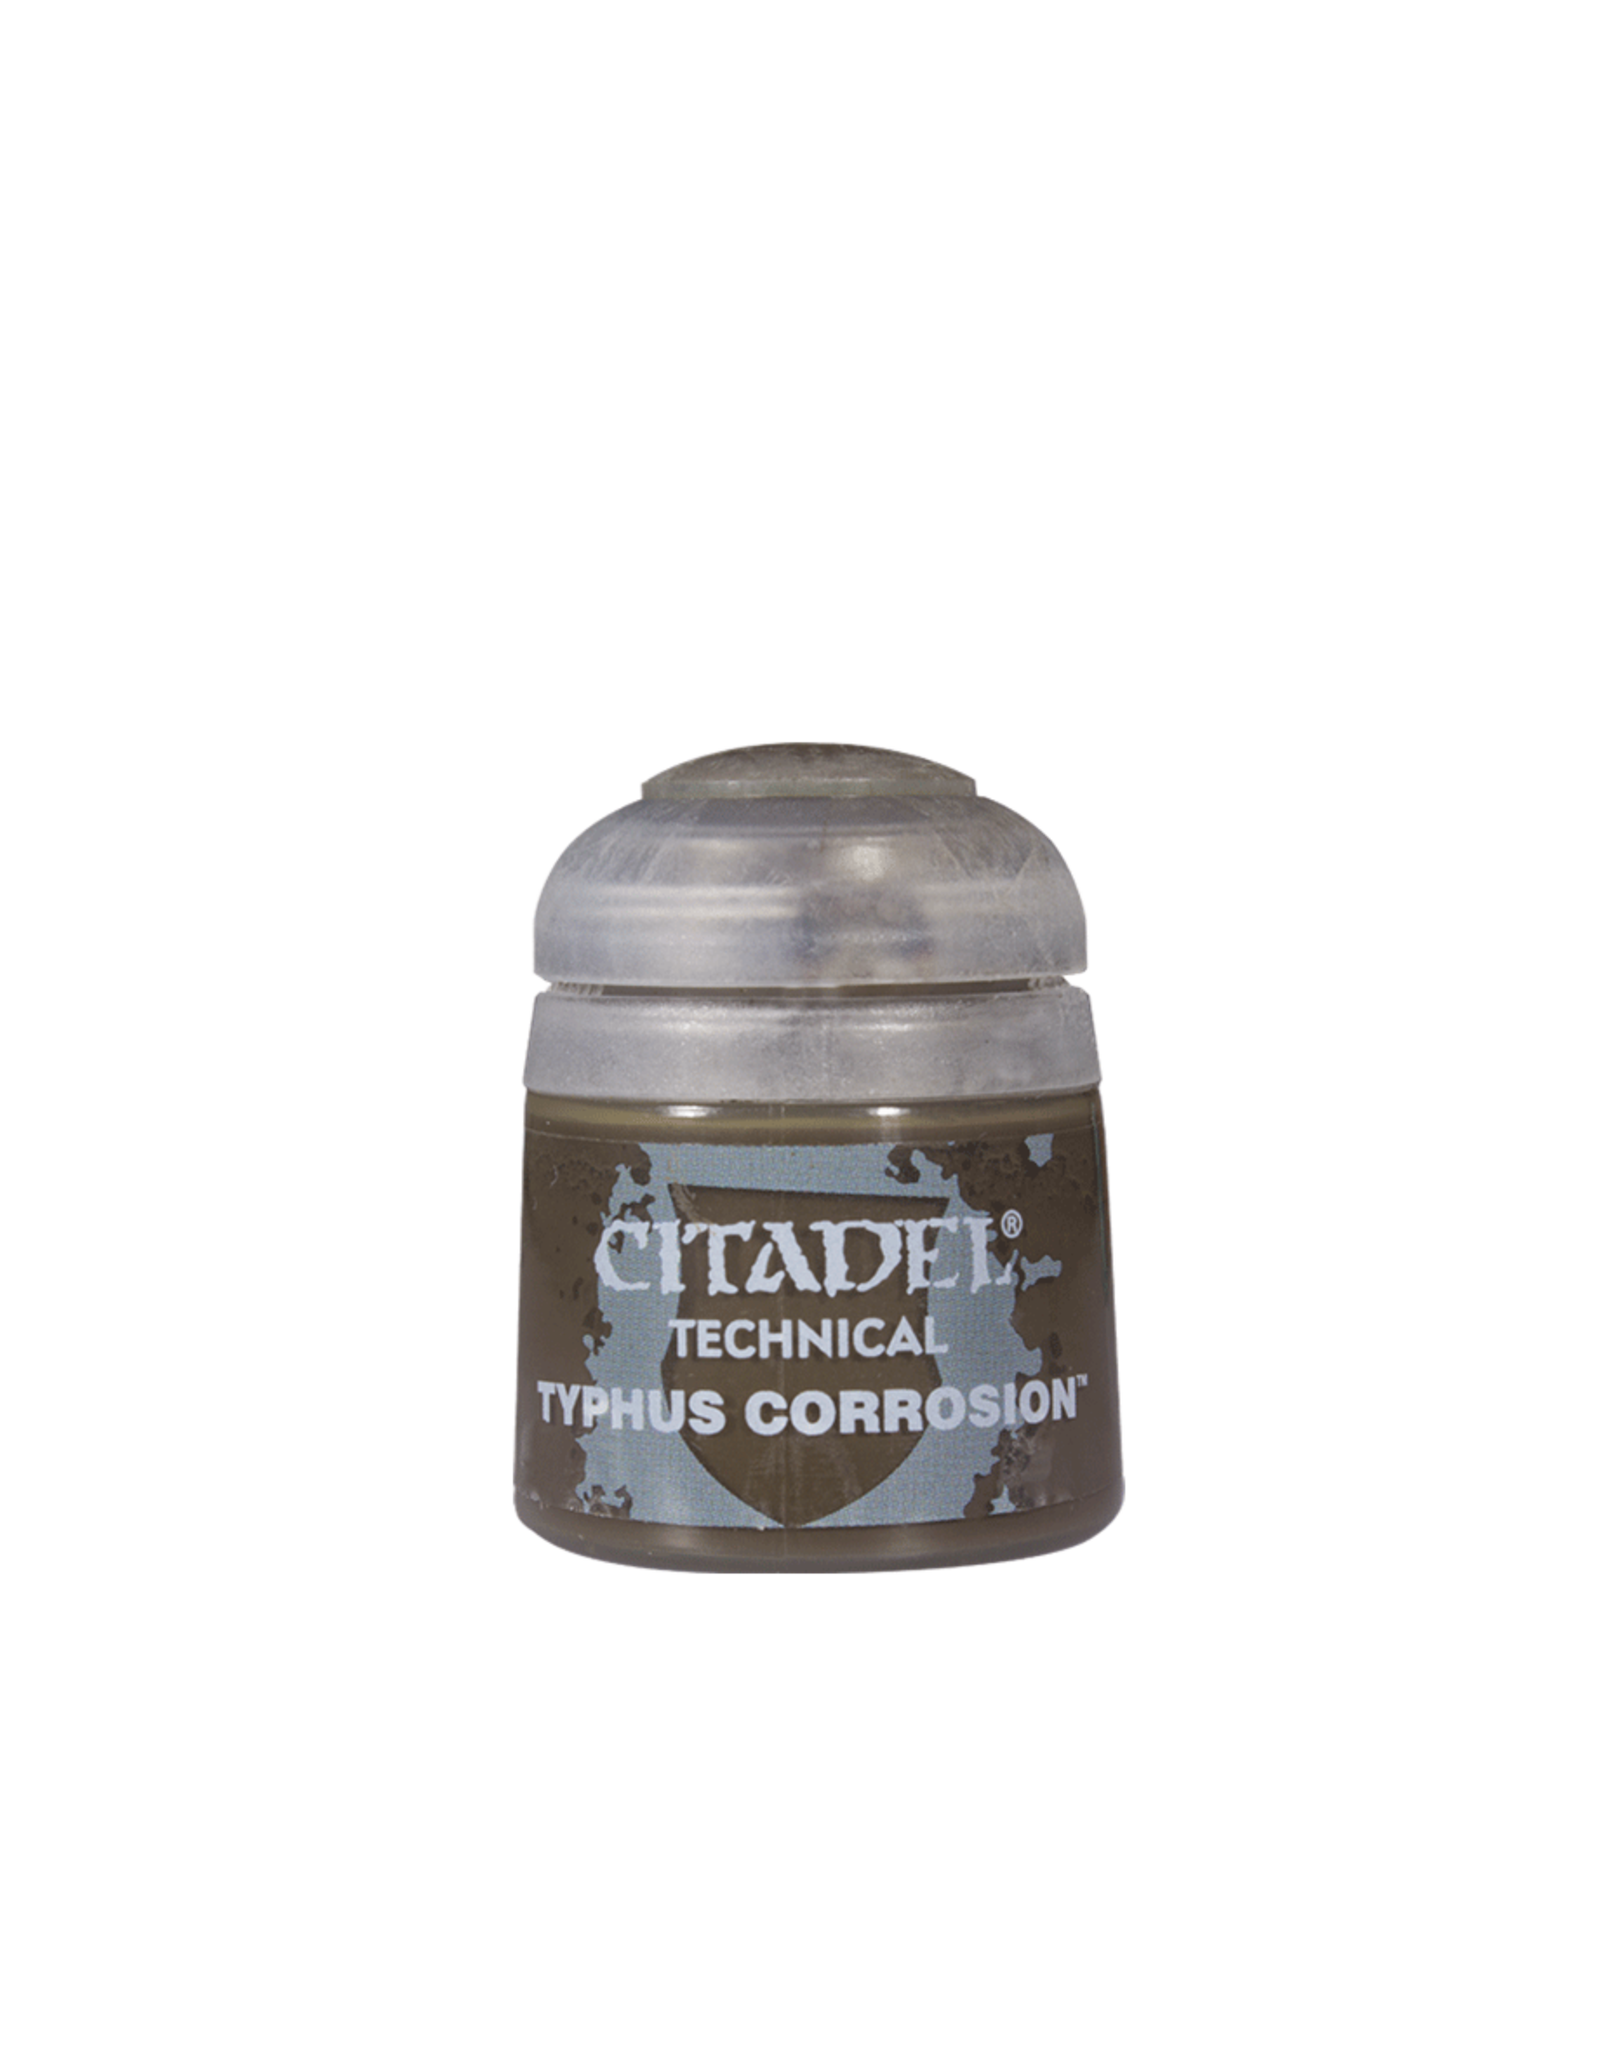 Citadel Citadel Paints Technical Paint Typhus Corrosion